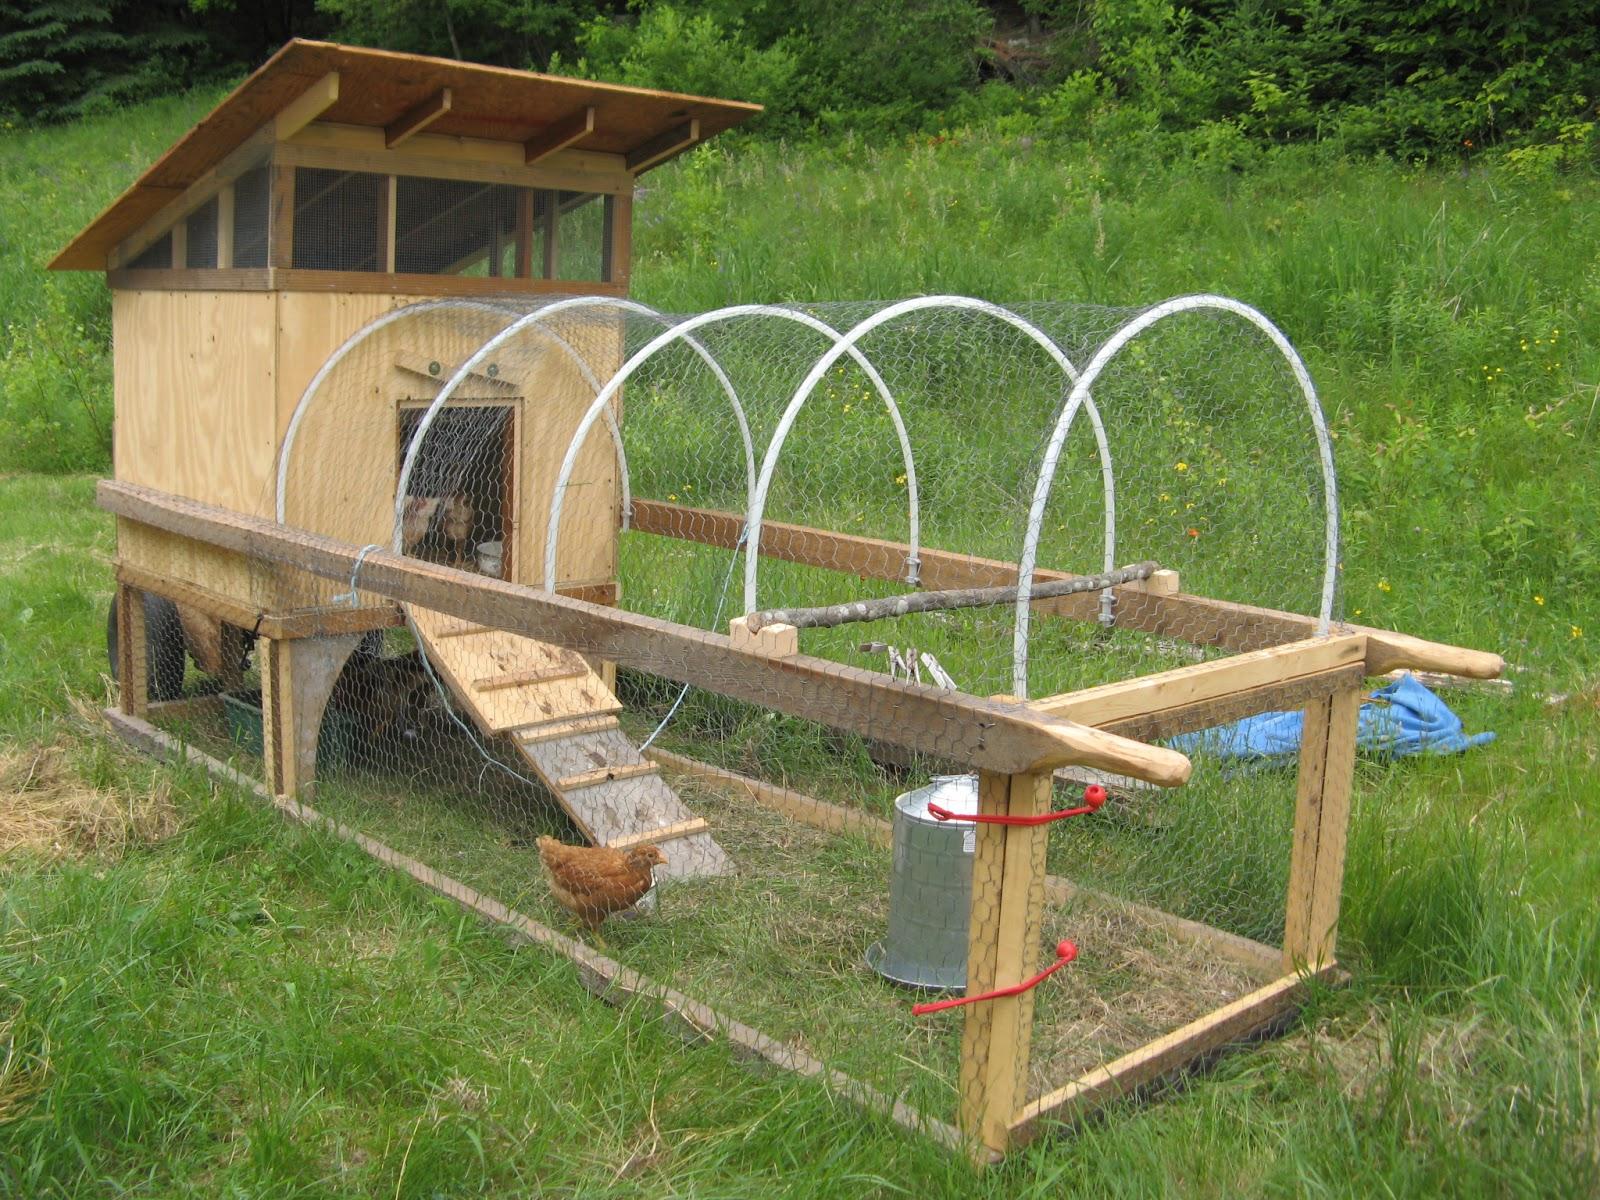 Chicken Tractors On Wheels : Animal instinct barn chicken tractor views